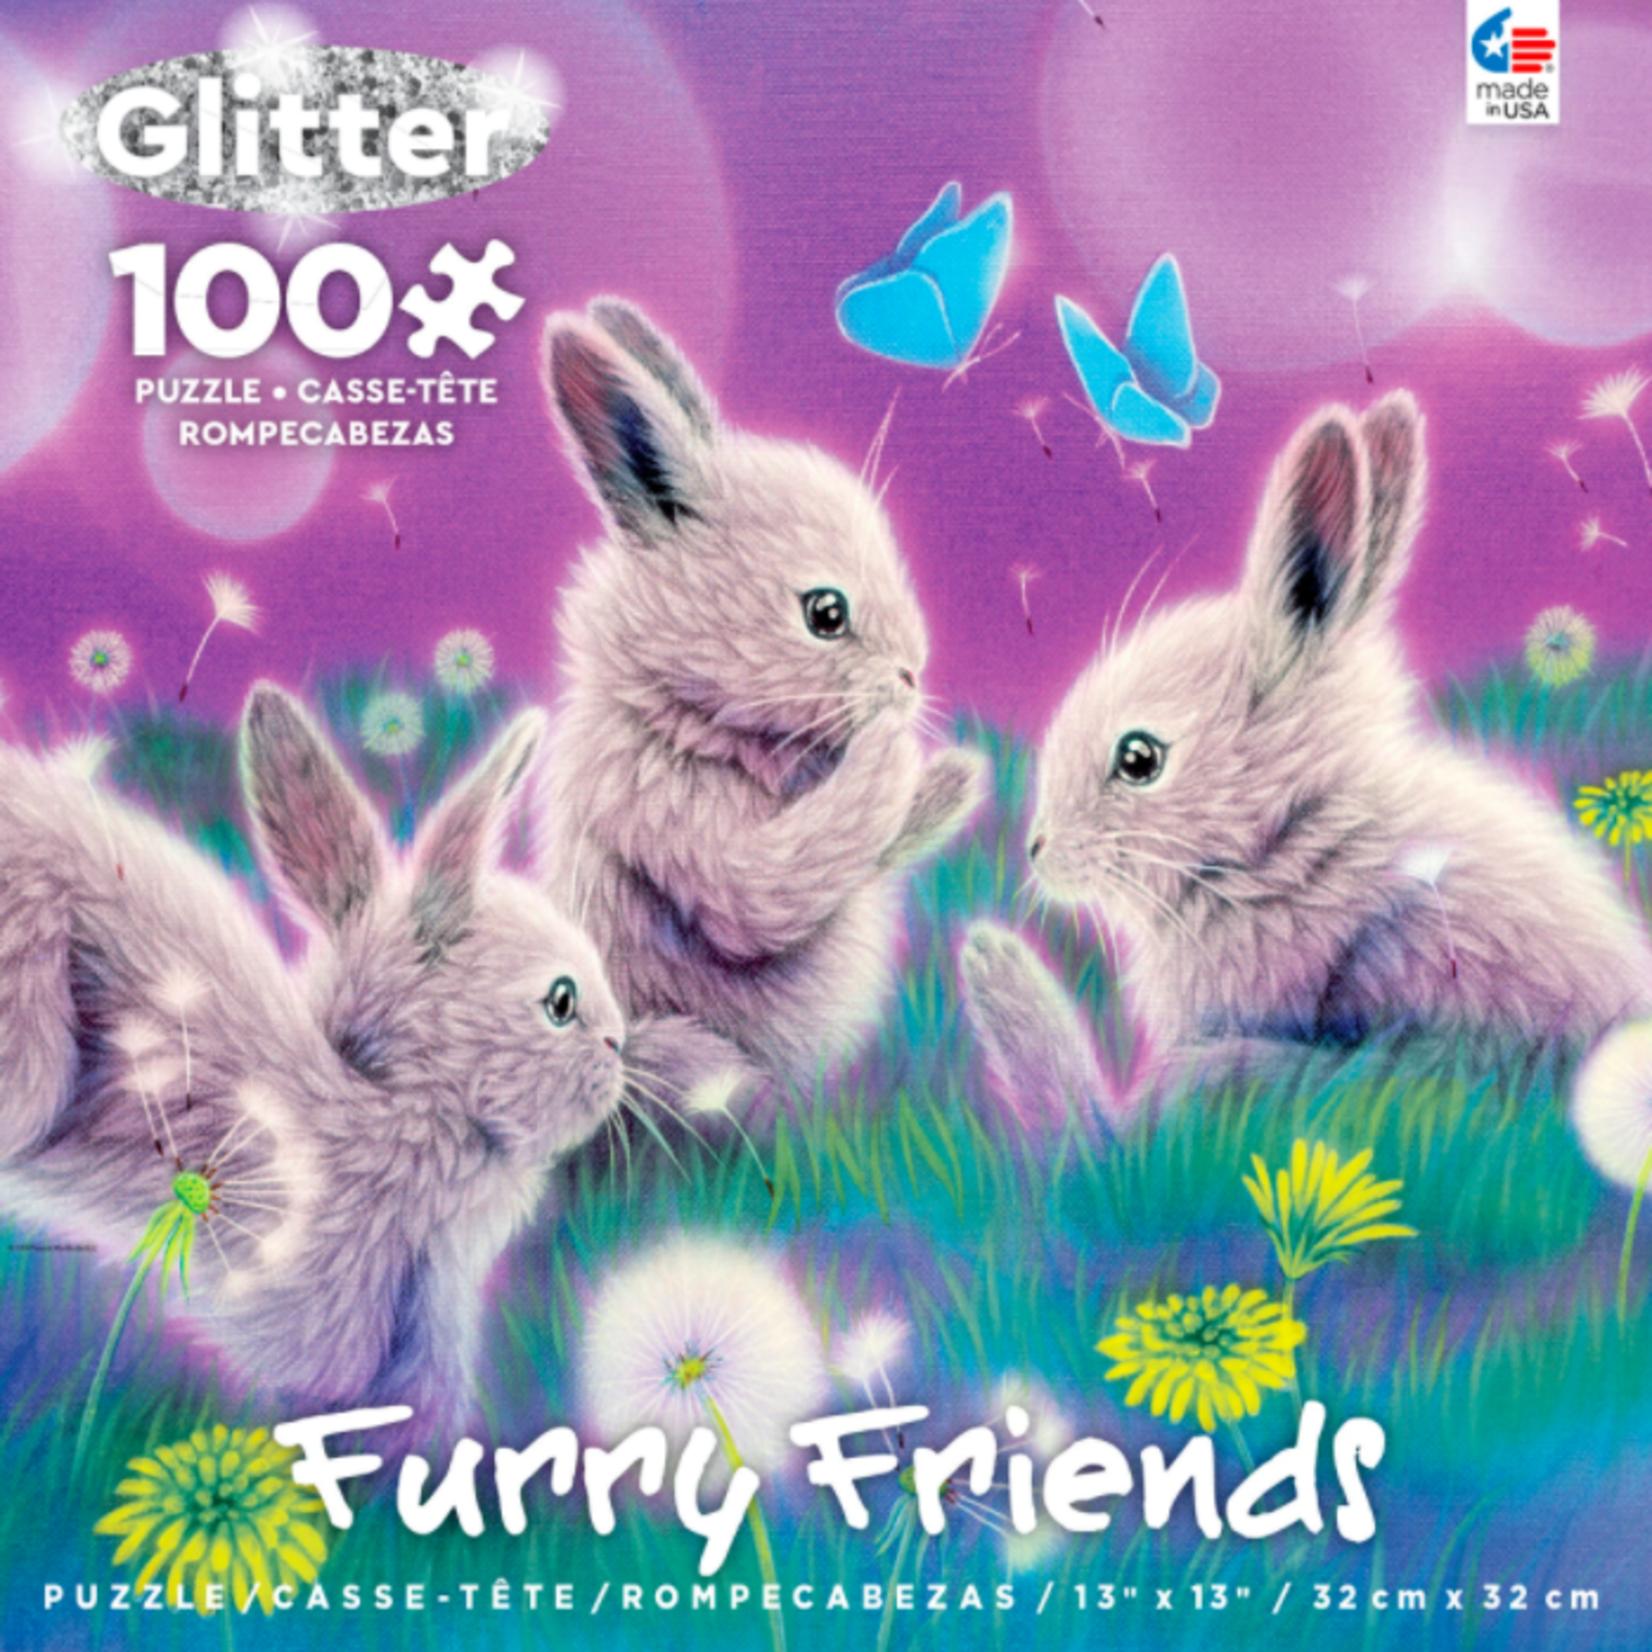 ceaco Ceaco - 100 Piece Puzzle: Glitter Furry Friends - Spring Has Sprung